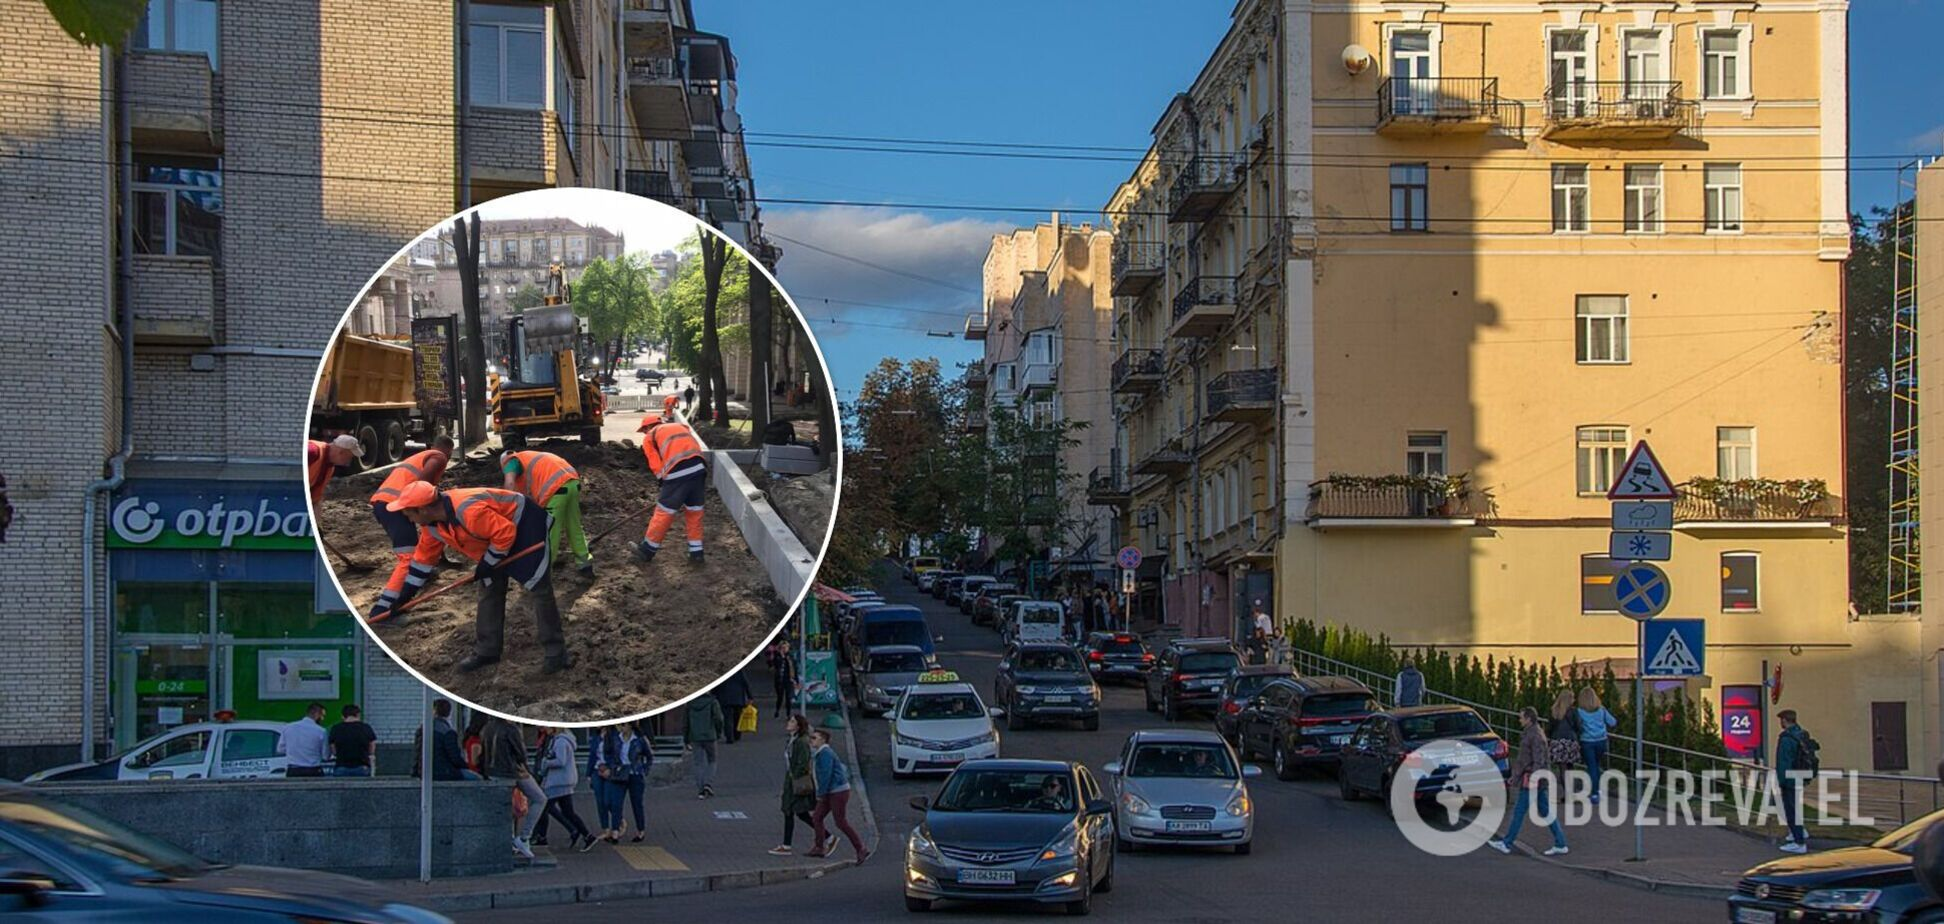 Работники 'Киевавтодора' проведут средний ремонт дорог